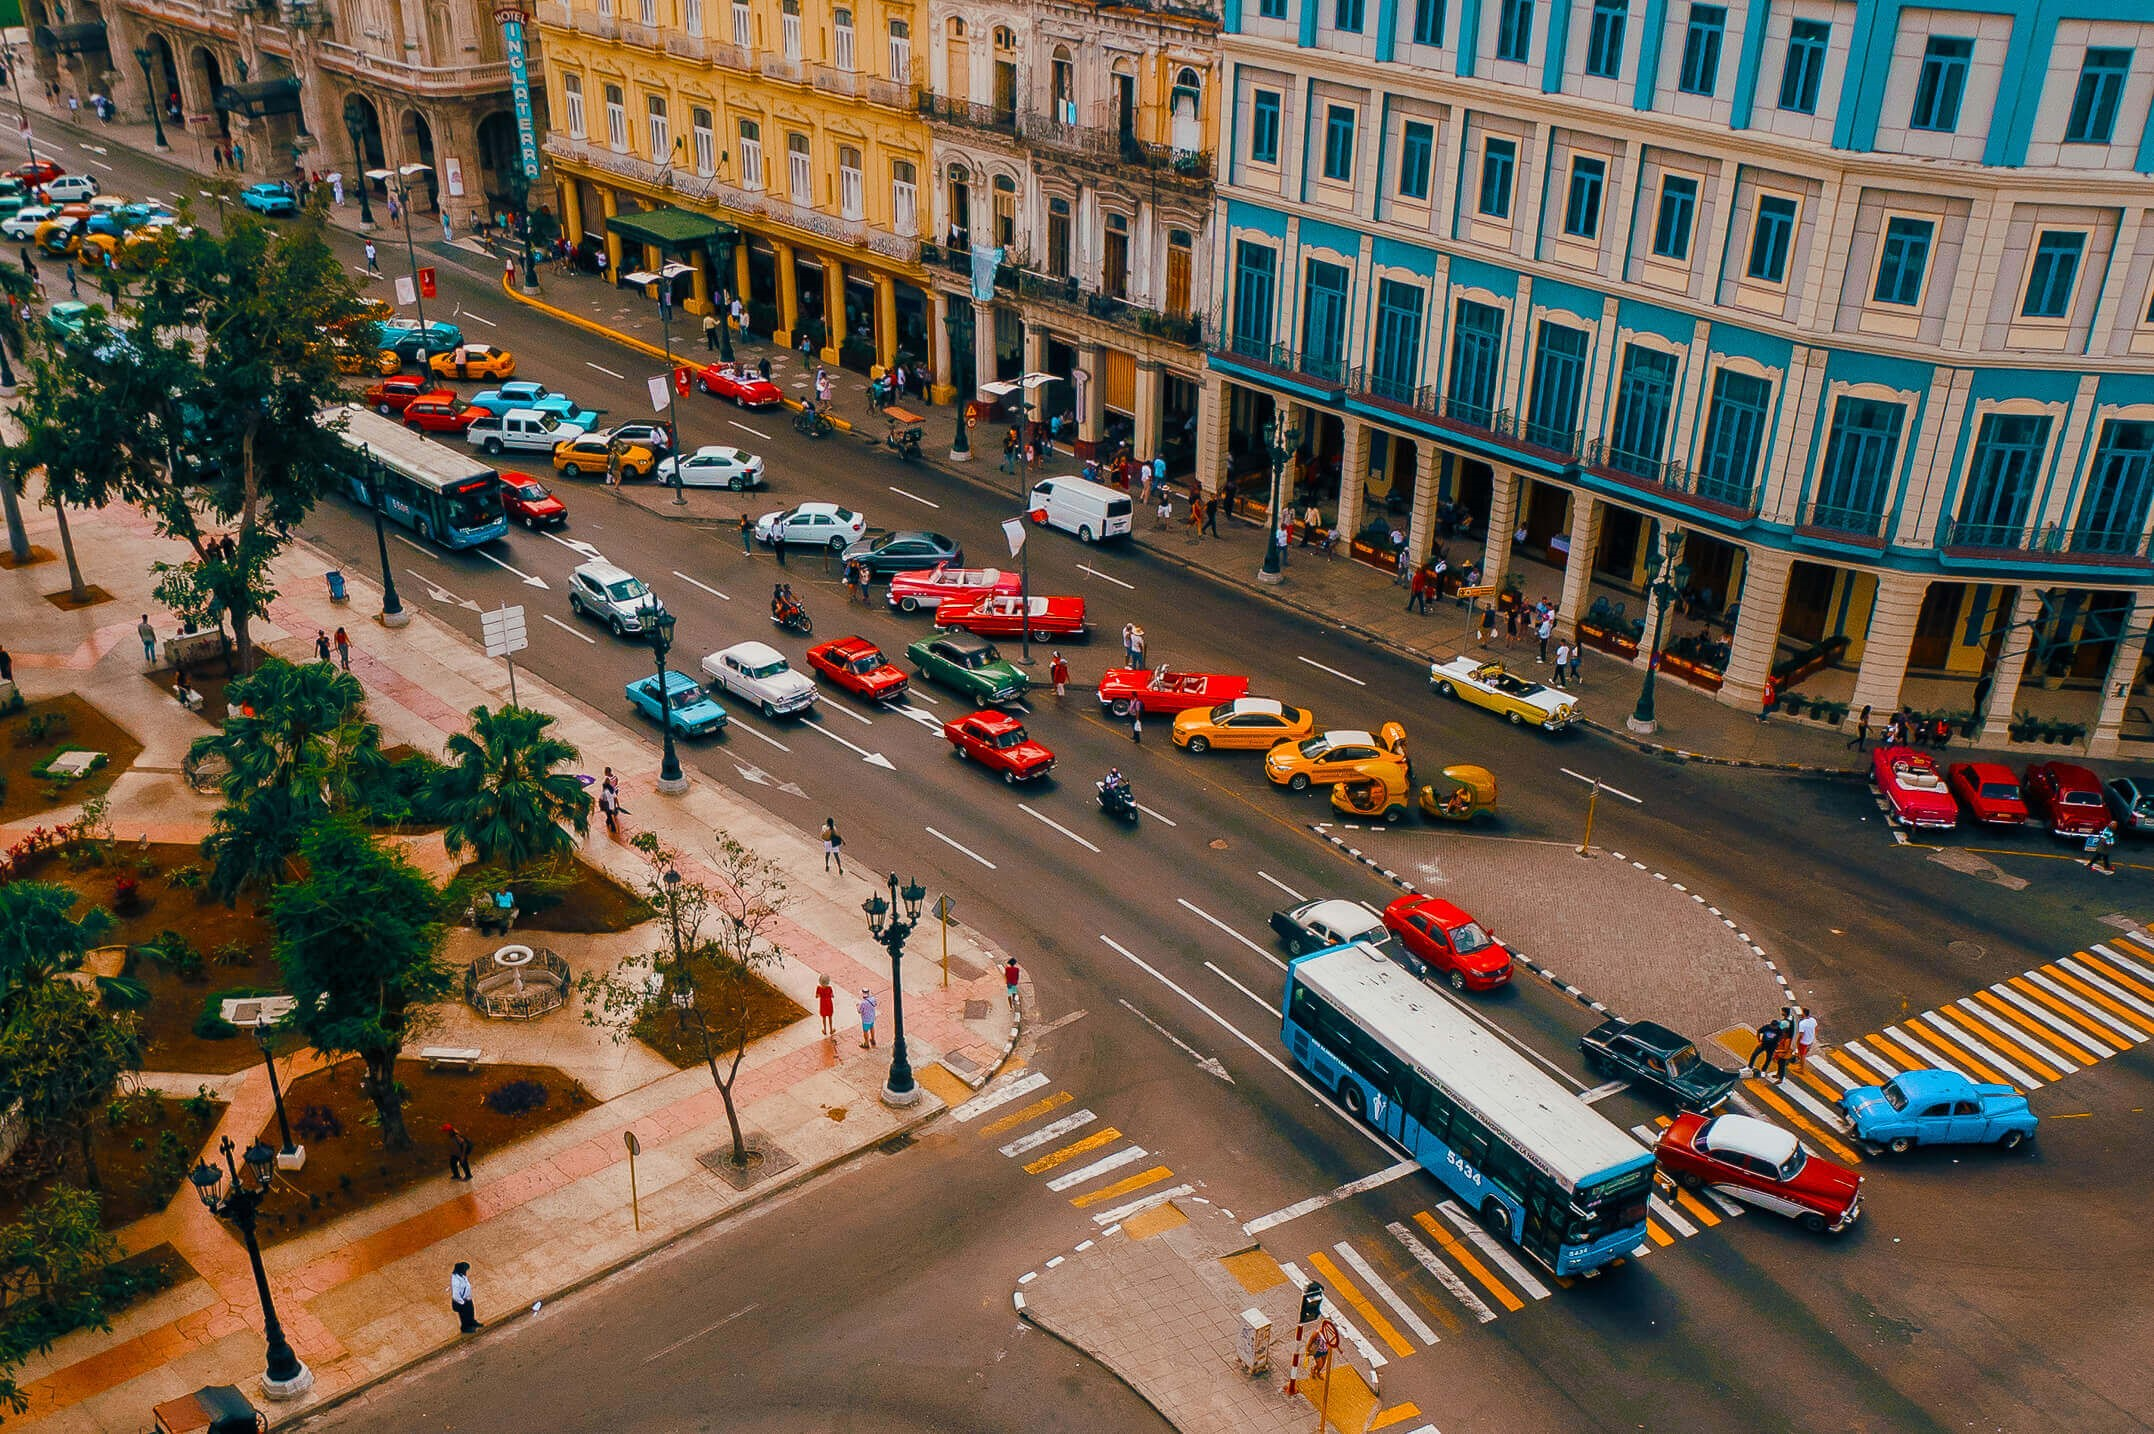 CUBA_CANDELA_havana_street (compressed).jpg